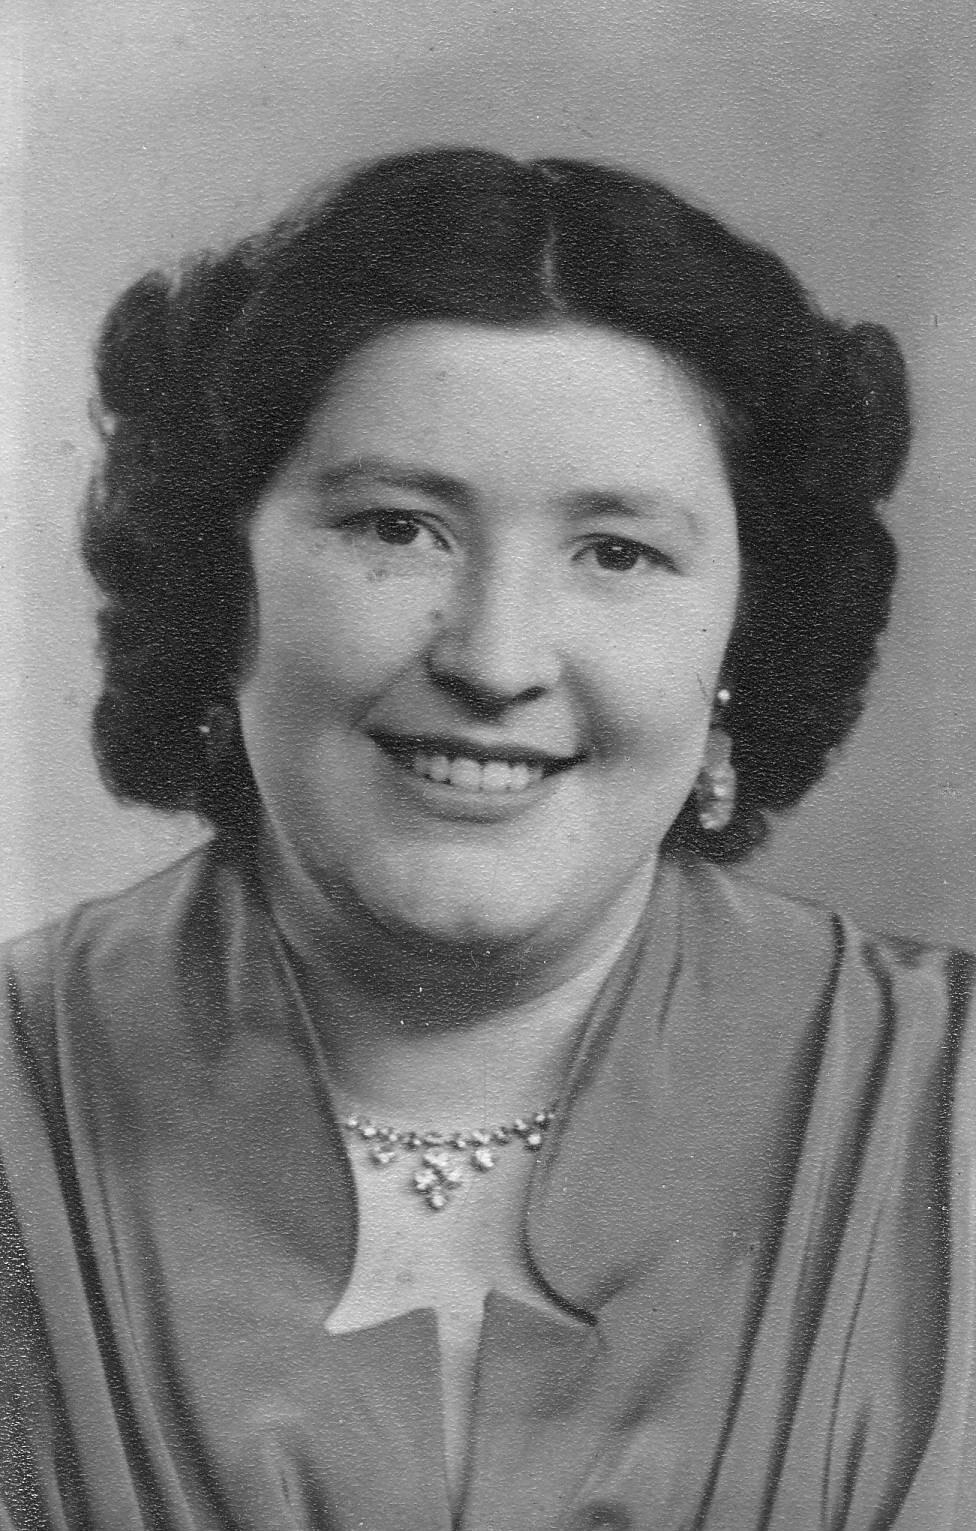 Mildred Devall 1929-2013 RIP.